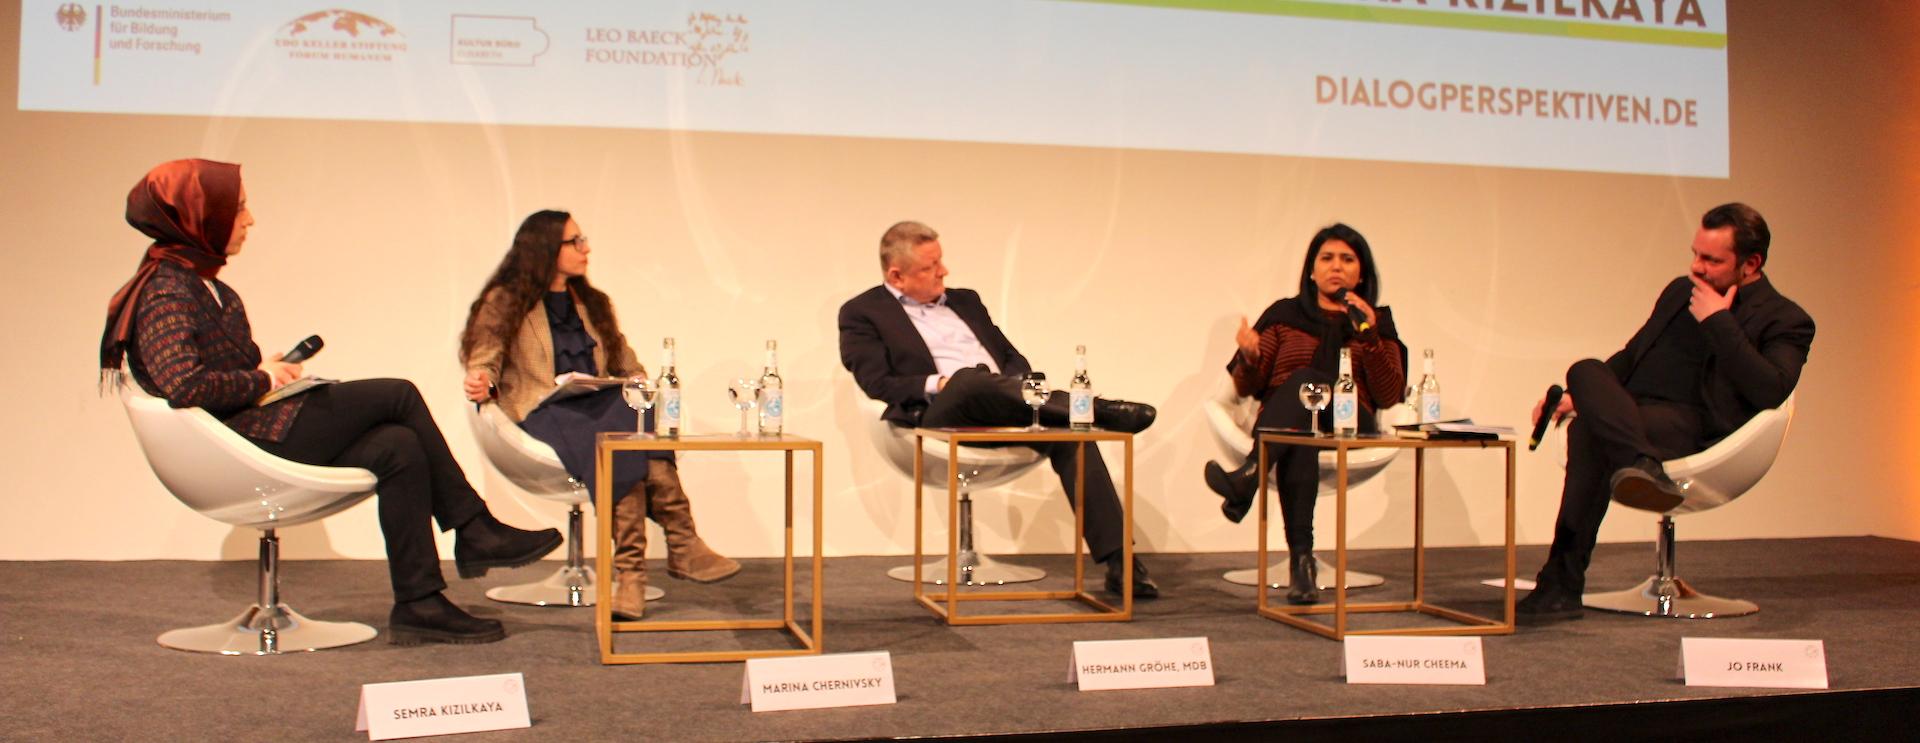 Semra Kızılkaya, Marina Chernivsky, Hermann Gröhe, MdB, Saba-Nur Cheema und Jo Frank im Gespräch